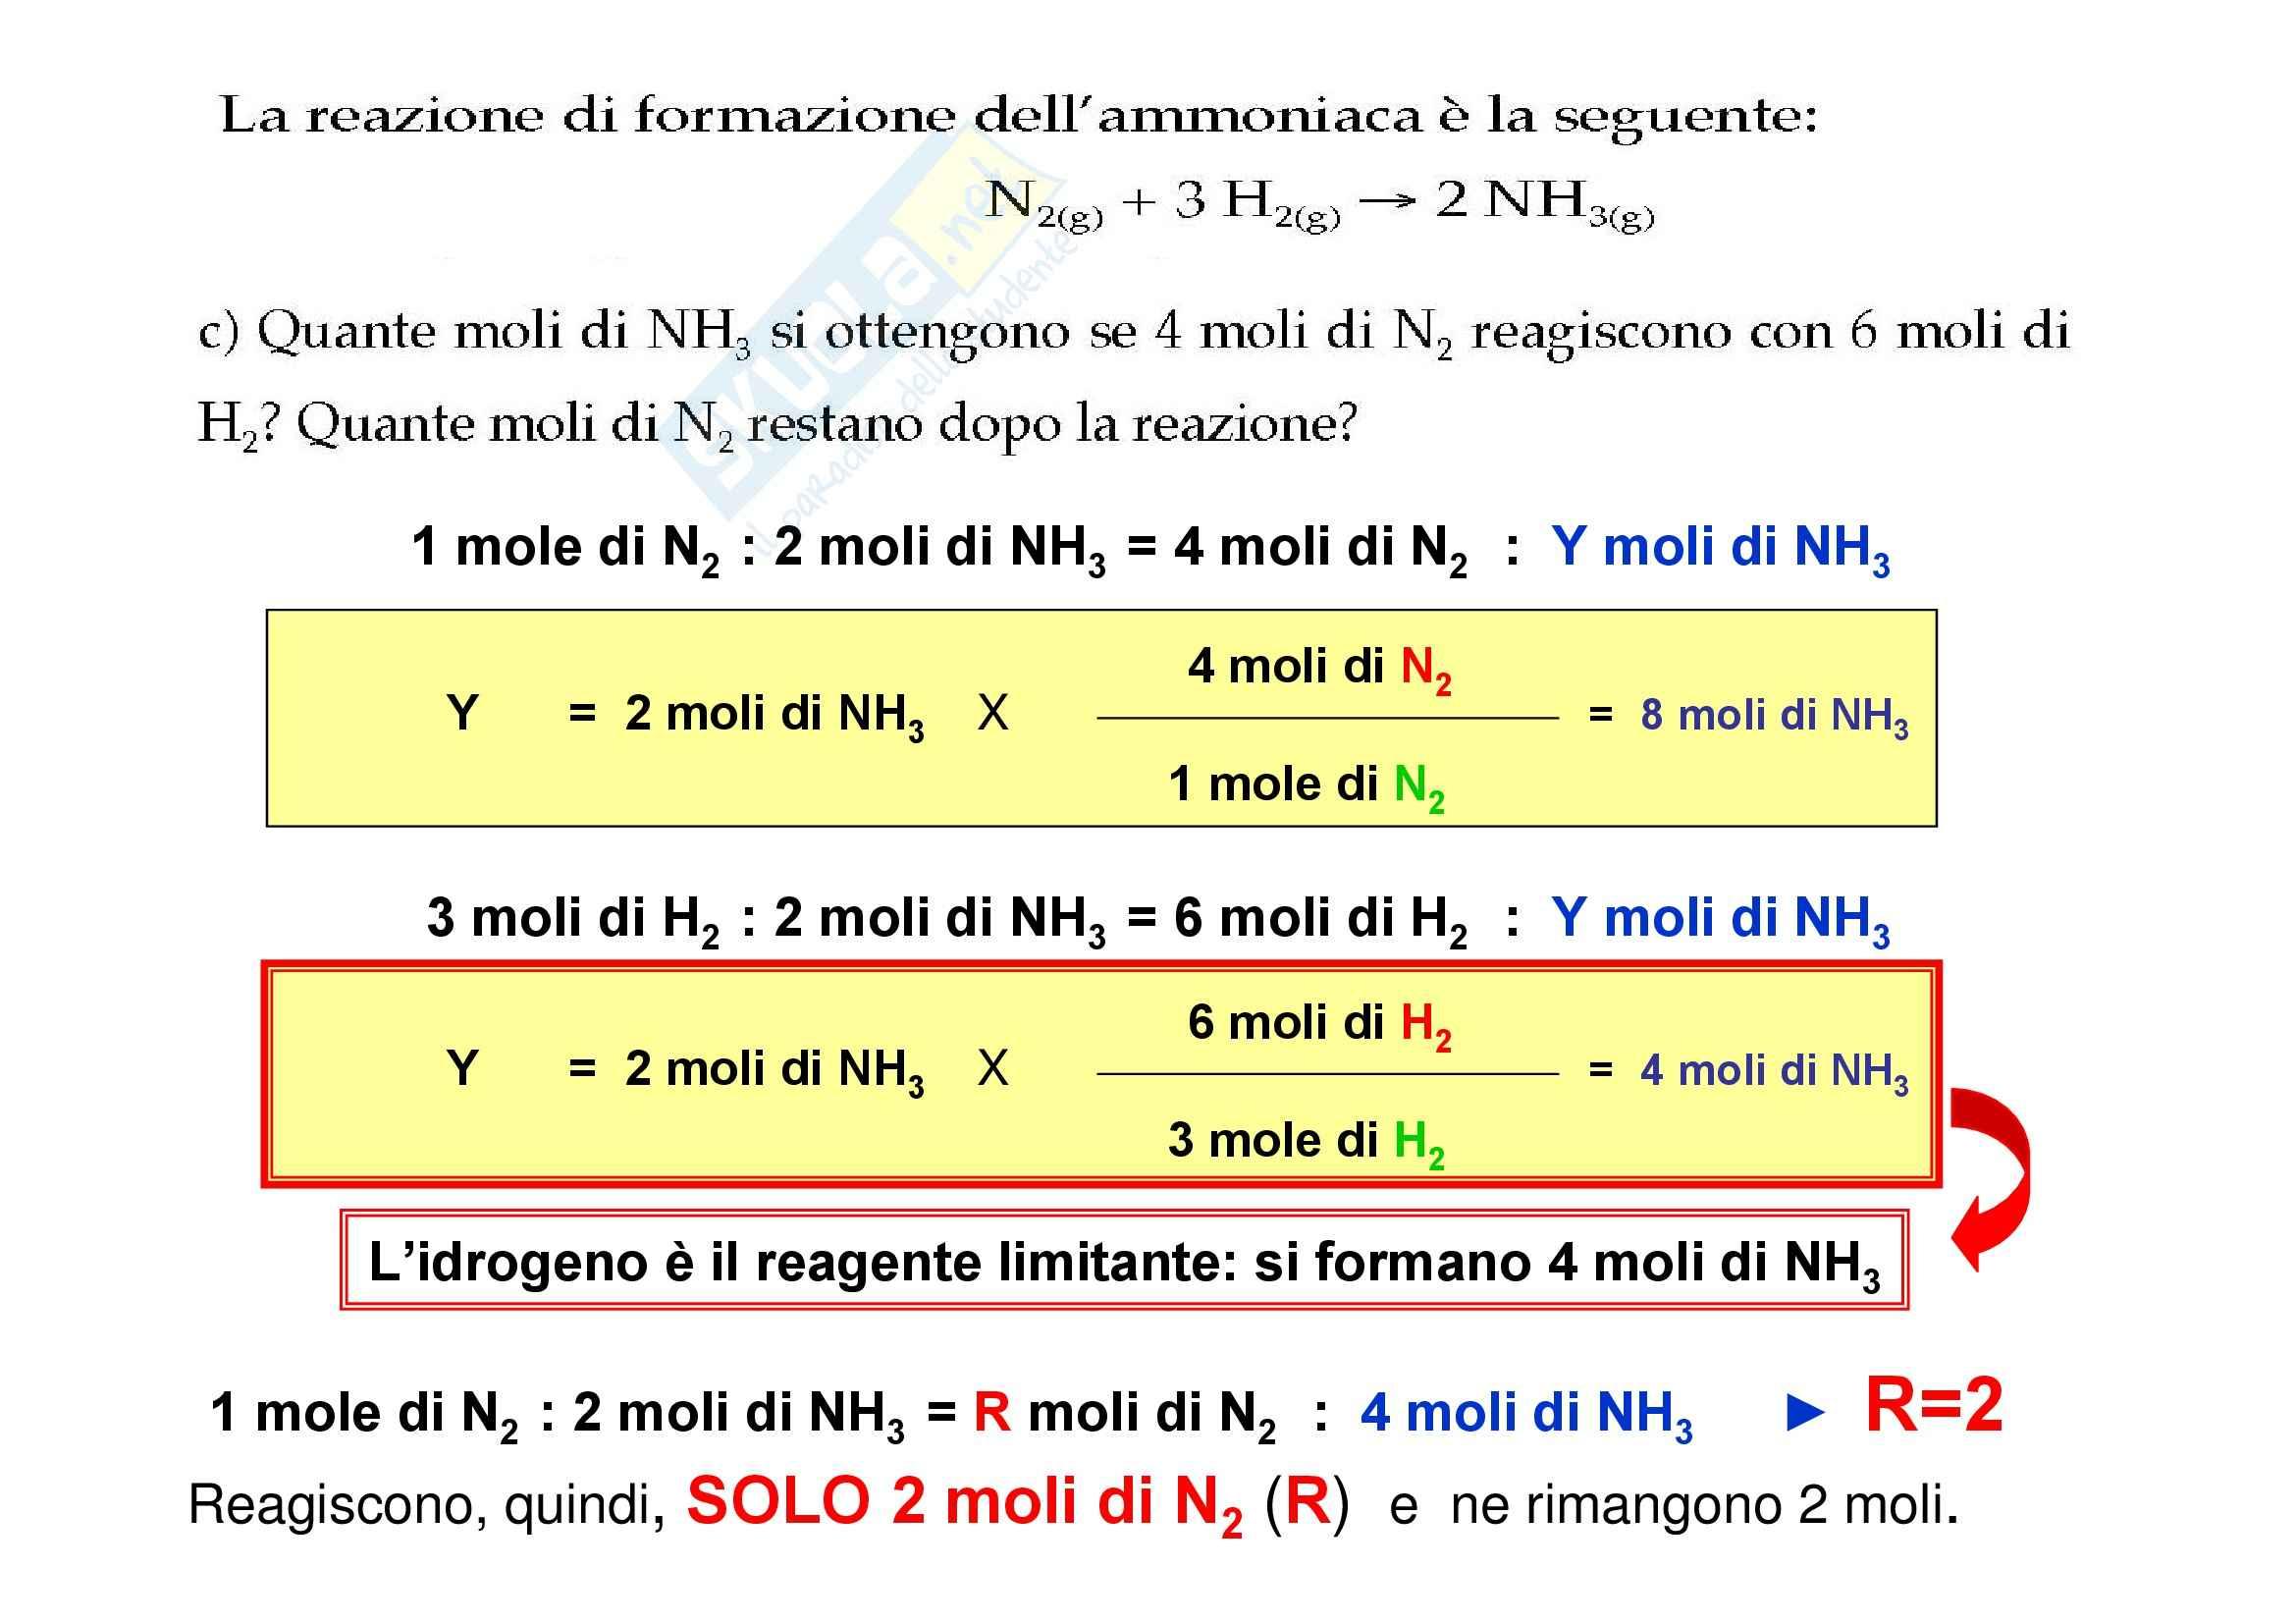 Chimica generale - la stechiometria Pag. 16